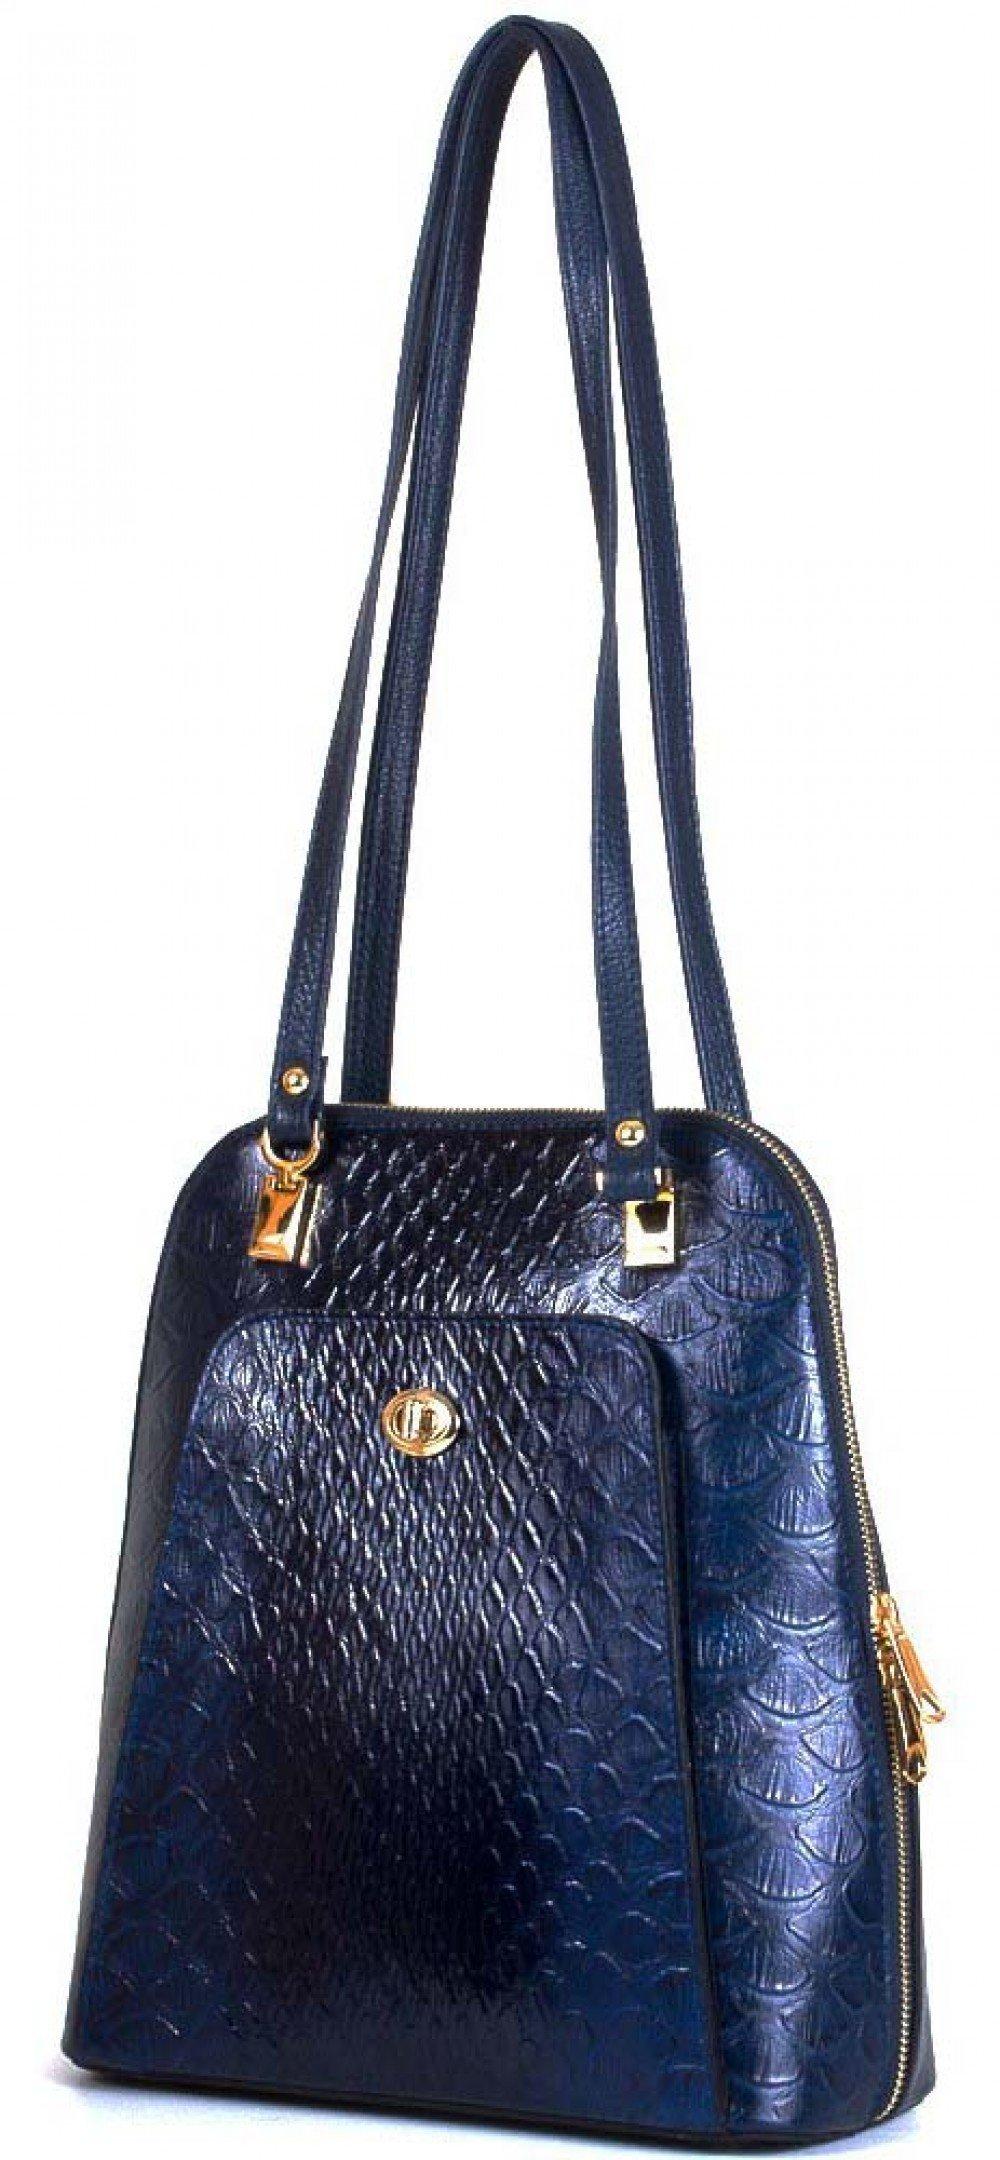 09d27915dba6 Женская кожаная сумка-рюкзак DESISAN SHI3132-6KR